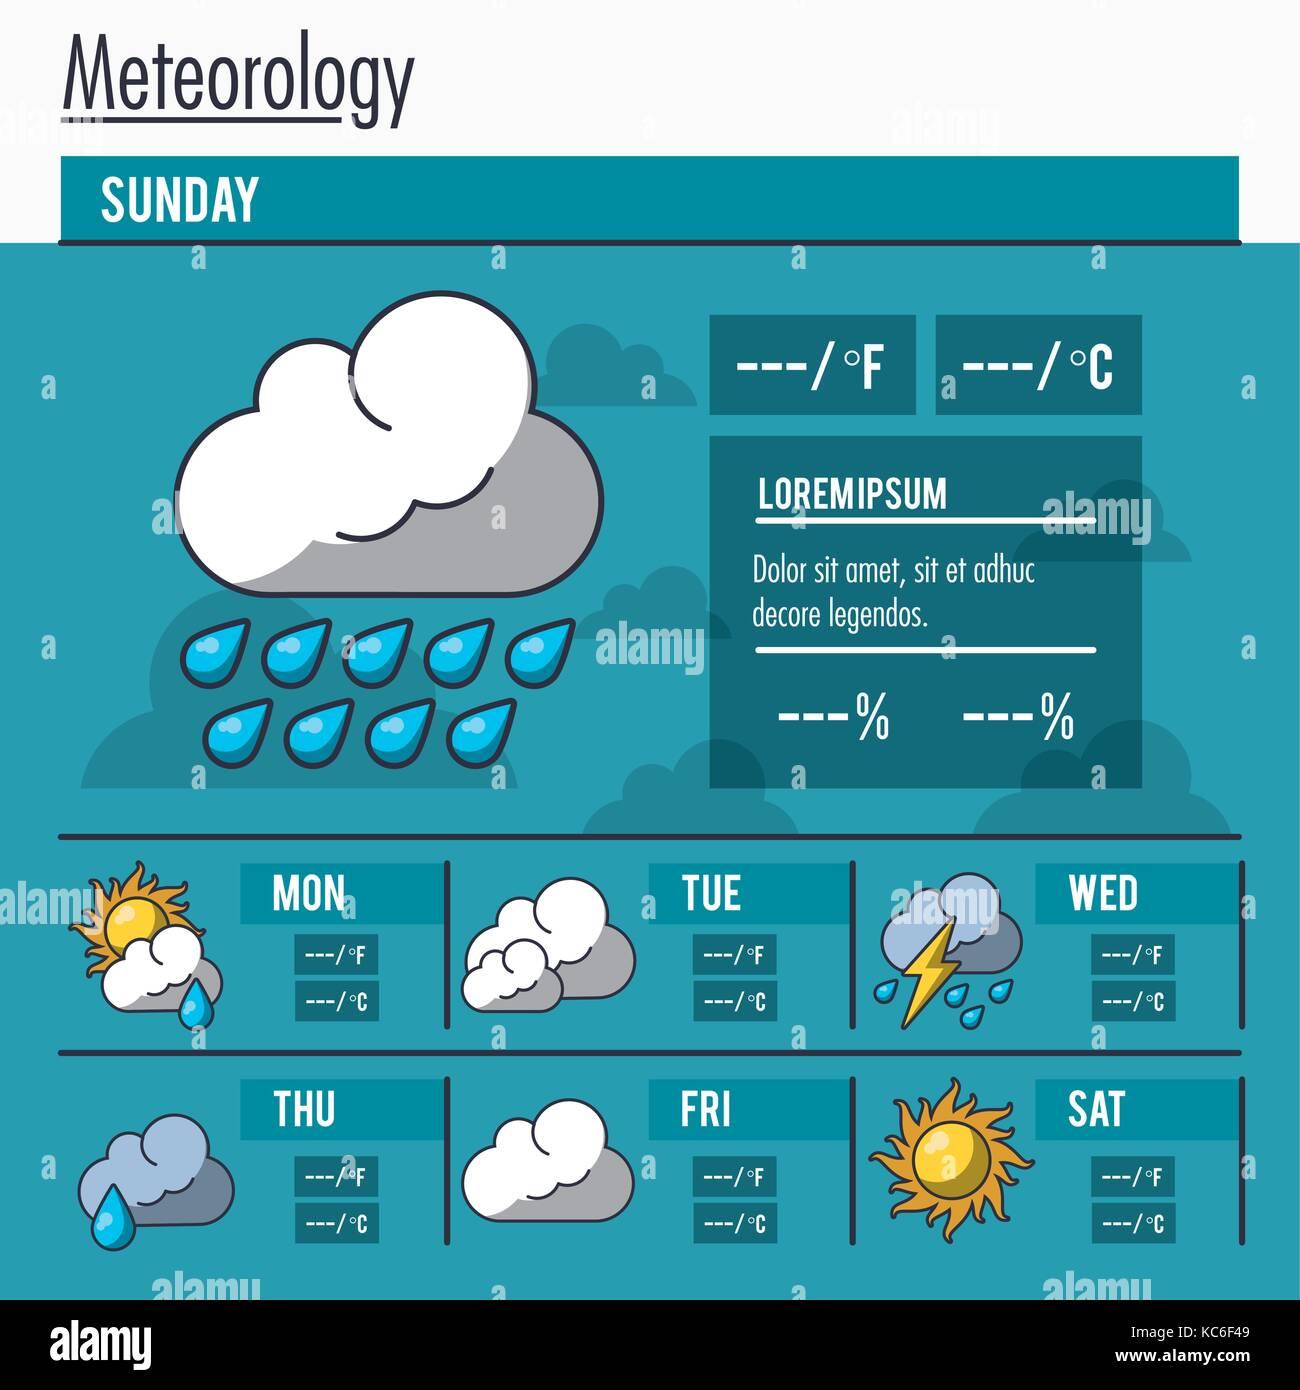 Meteorology infographic report - Stock Image